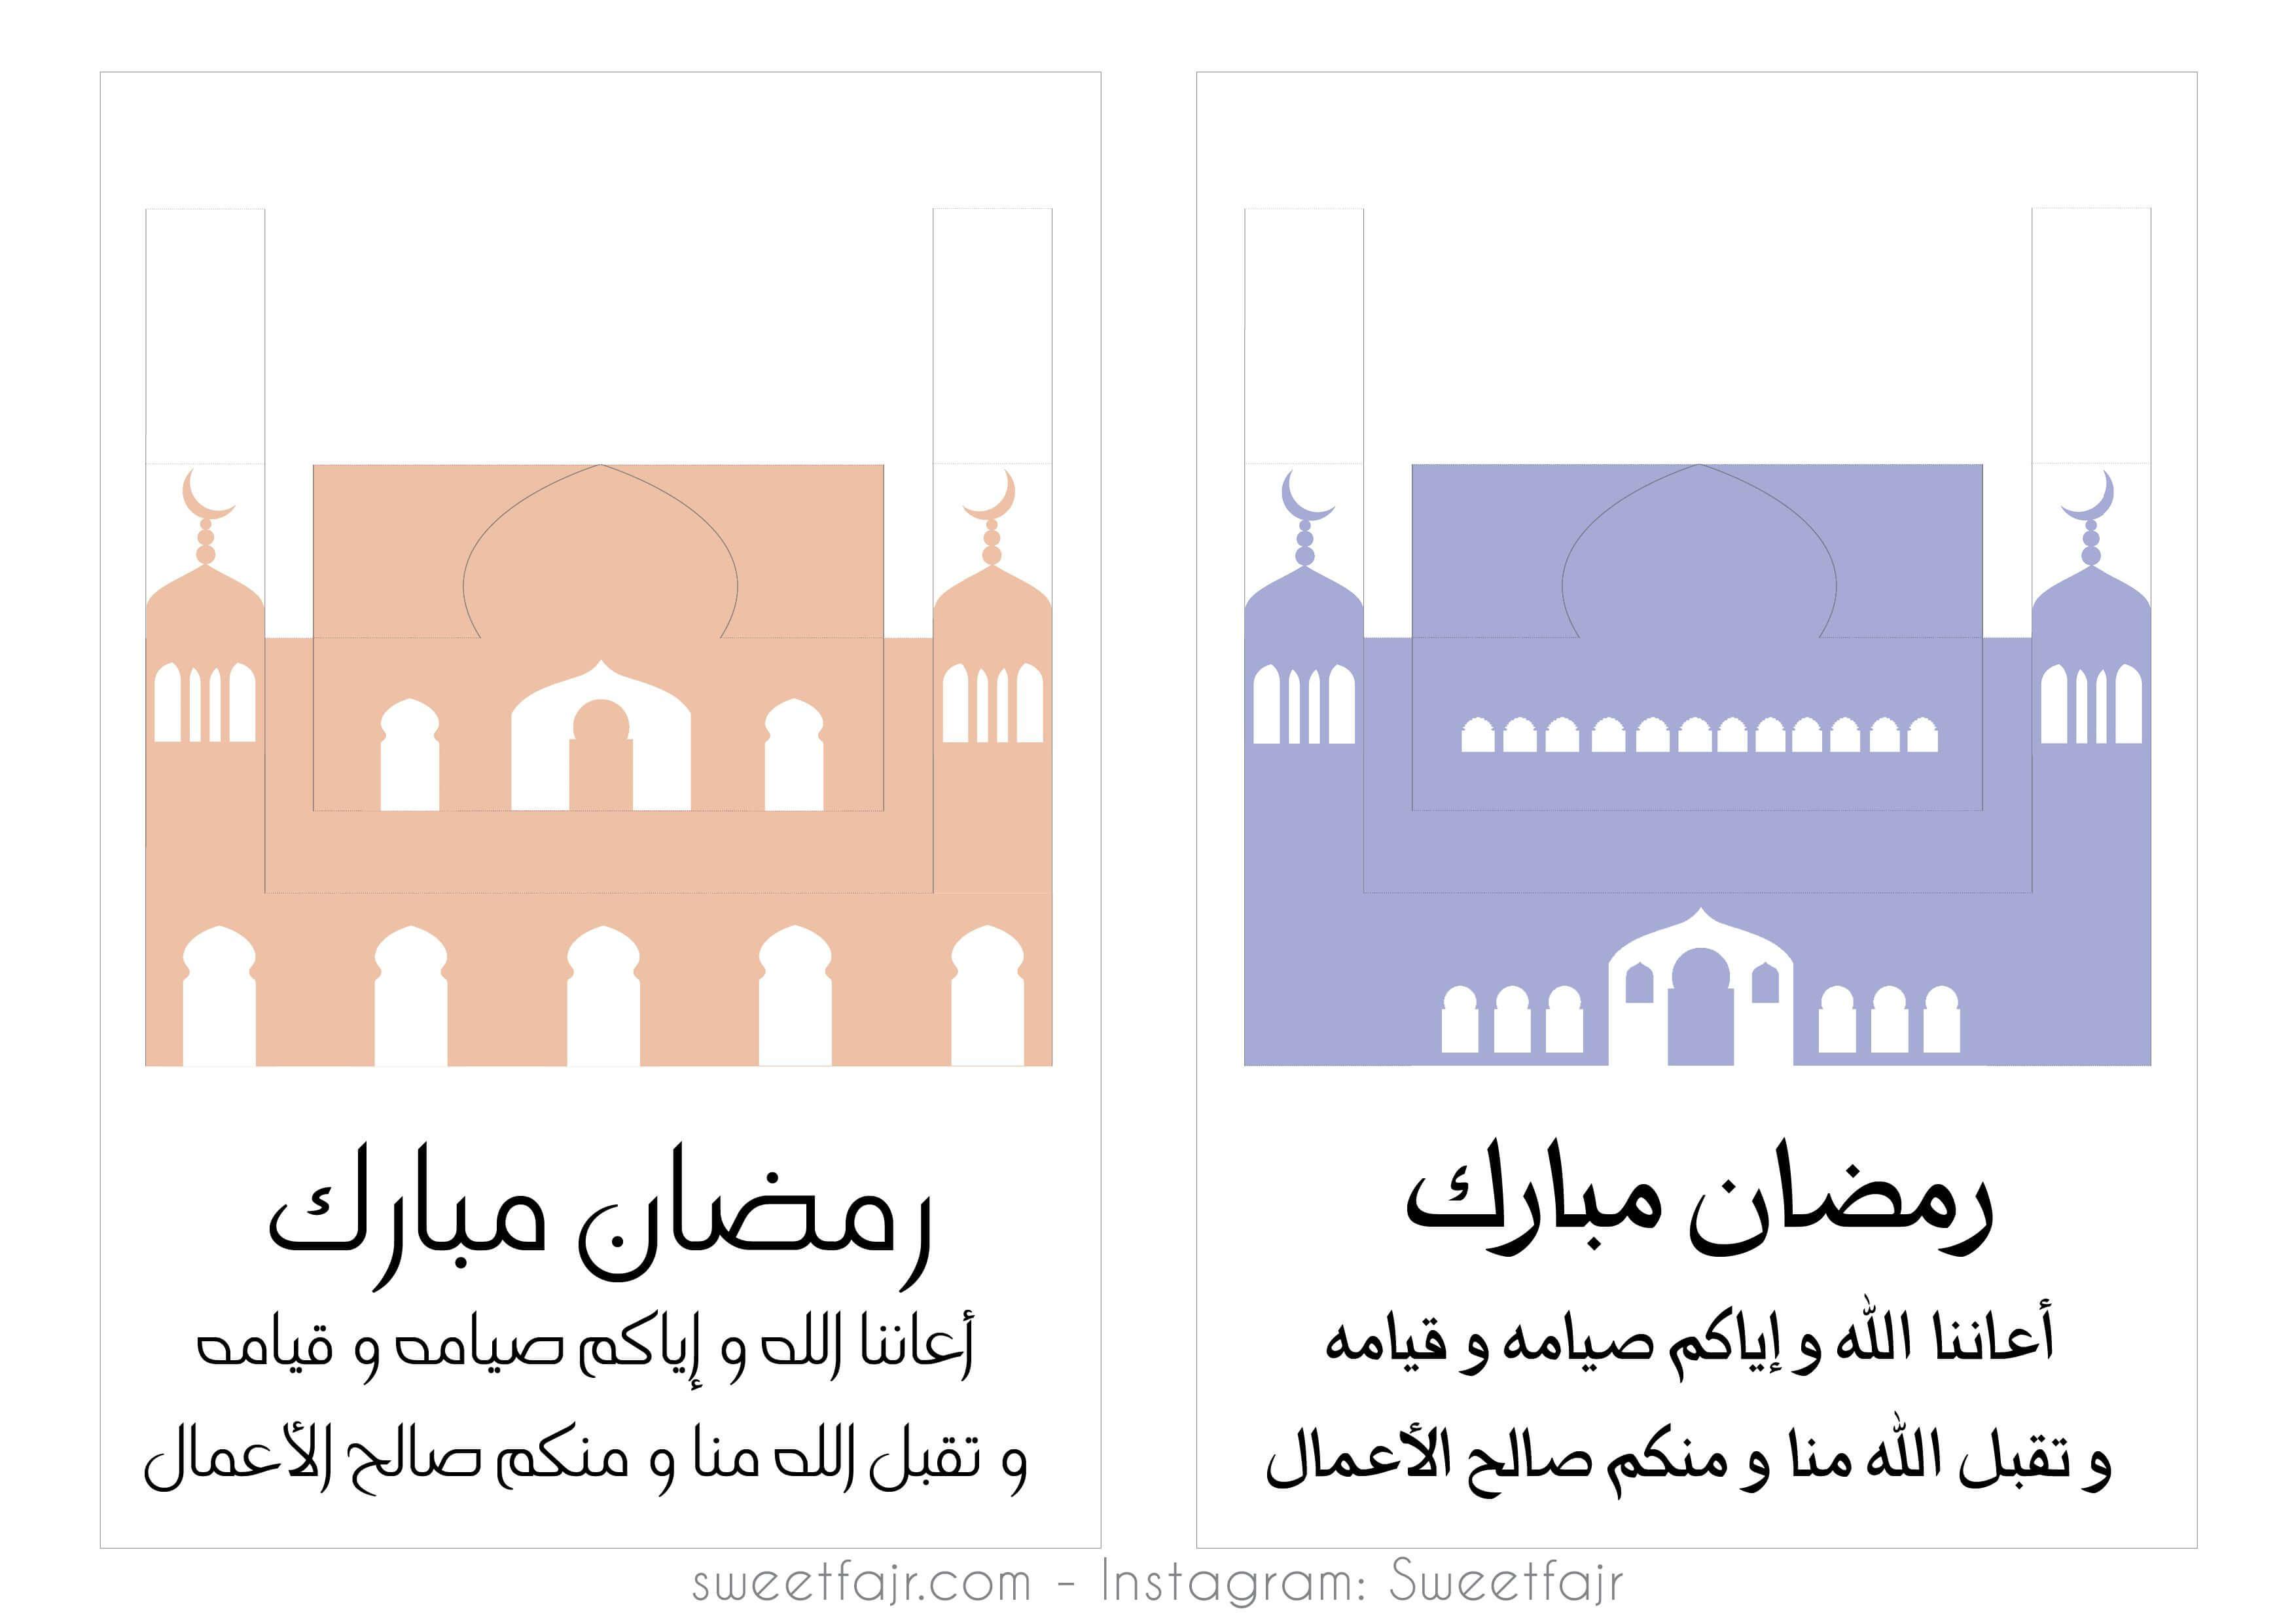 Pop Up Card Templates For Ramadan | Free Printable Pop-Up within Pop Up Card Templates Free Printable